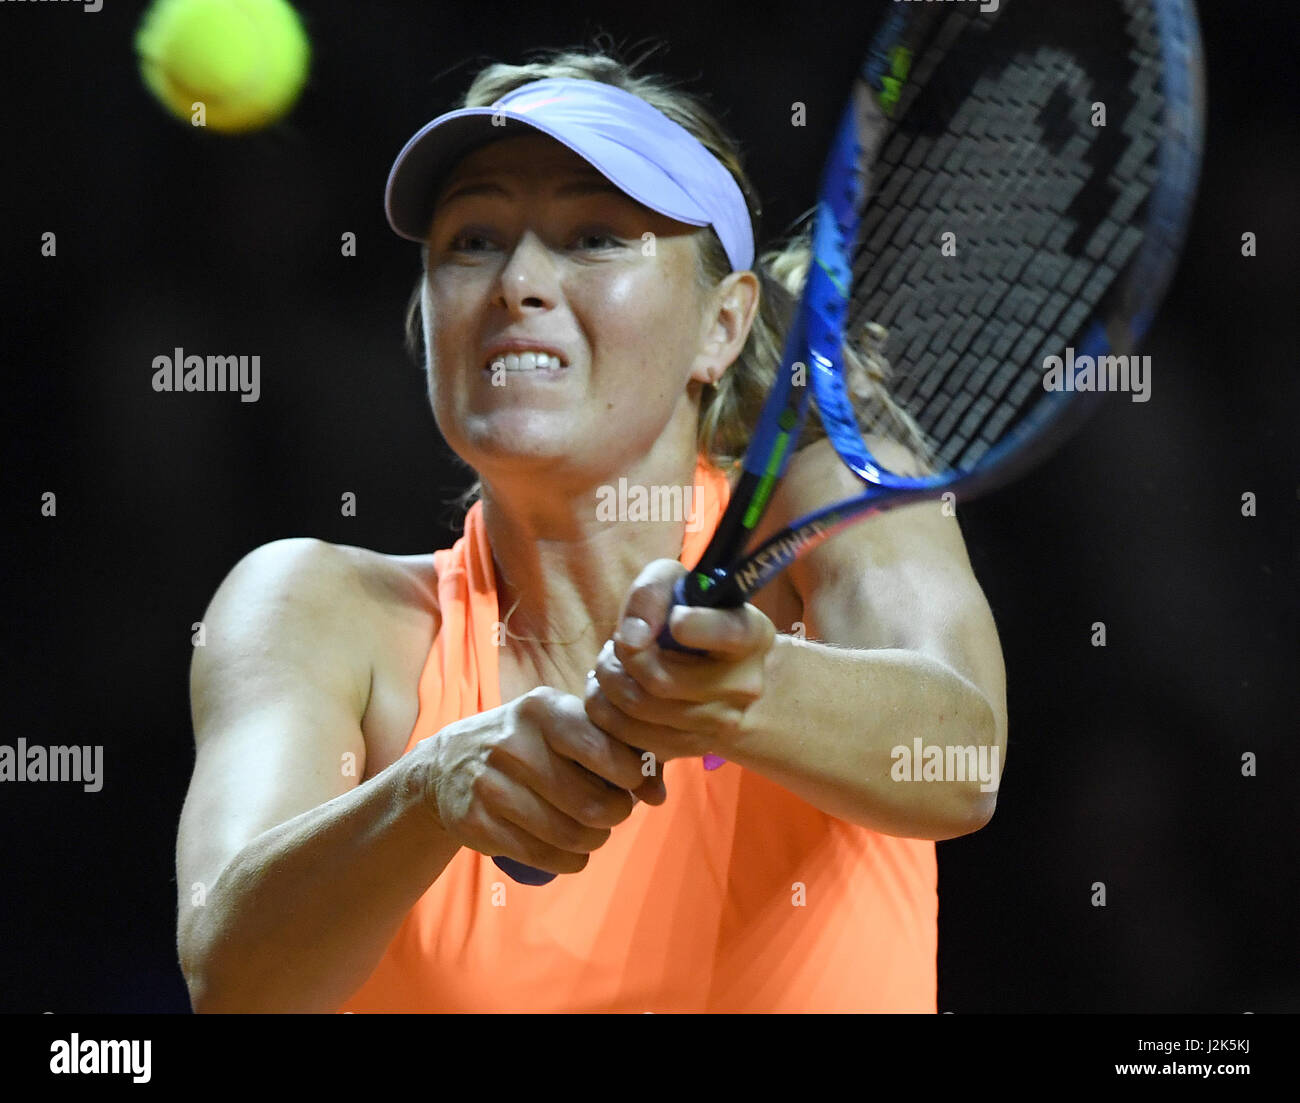 Singles Tennis Russian